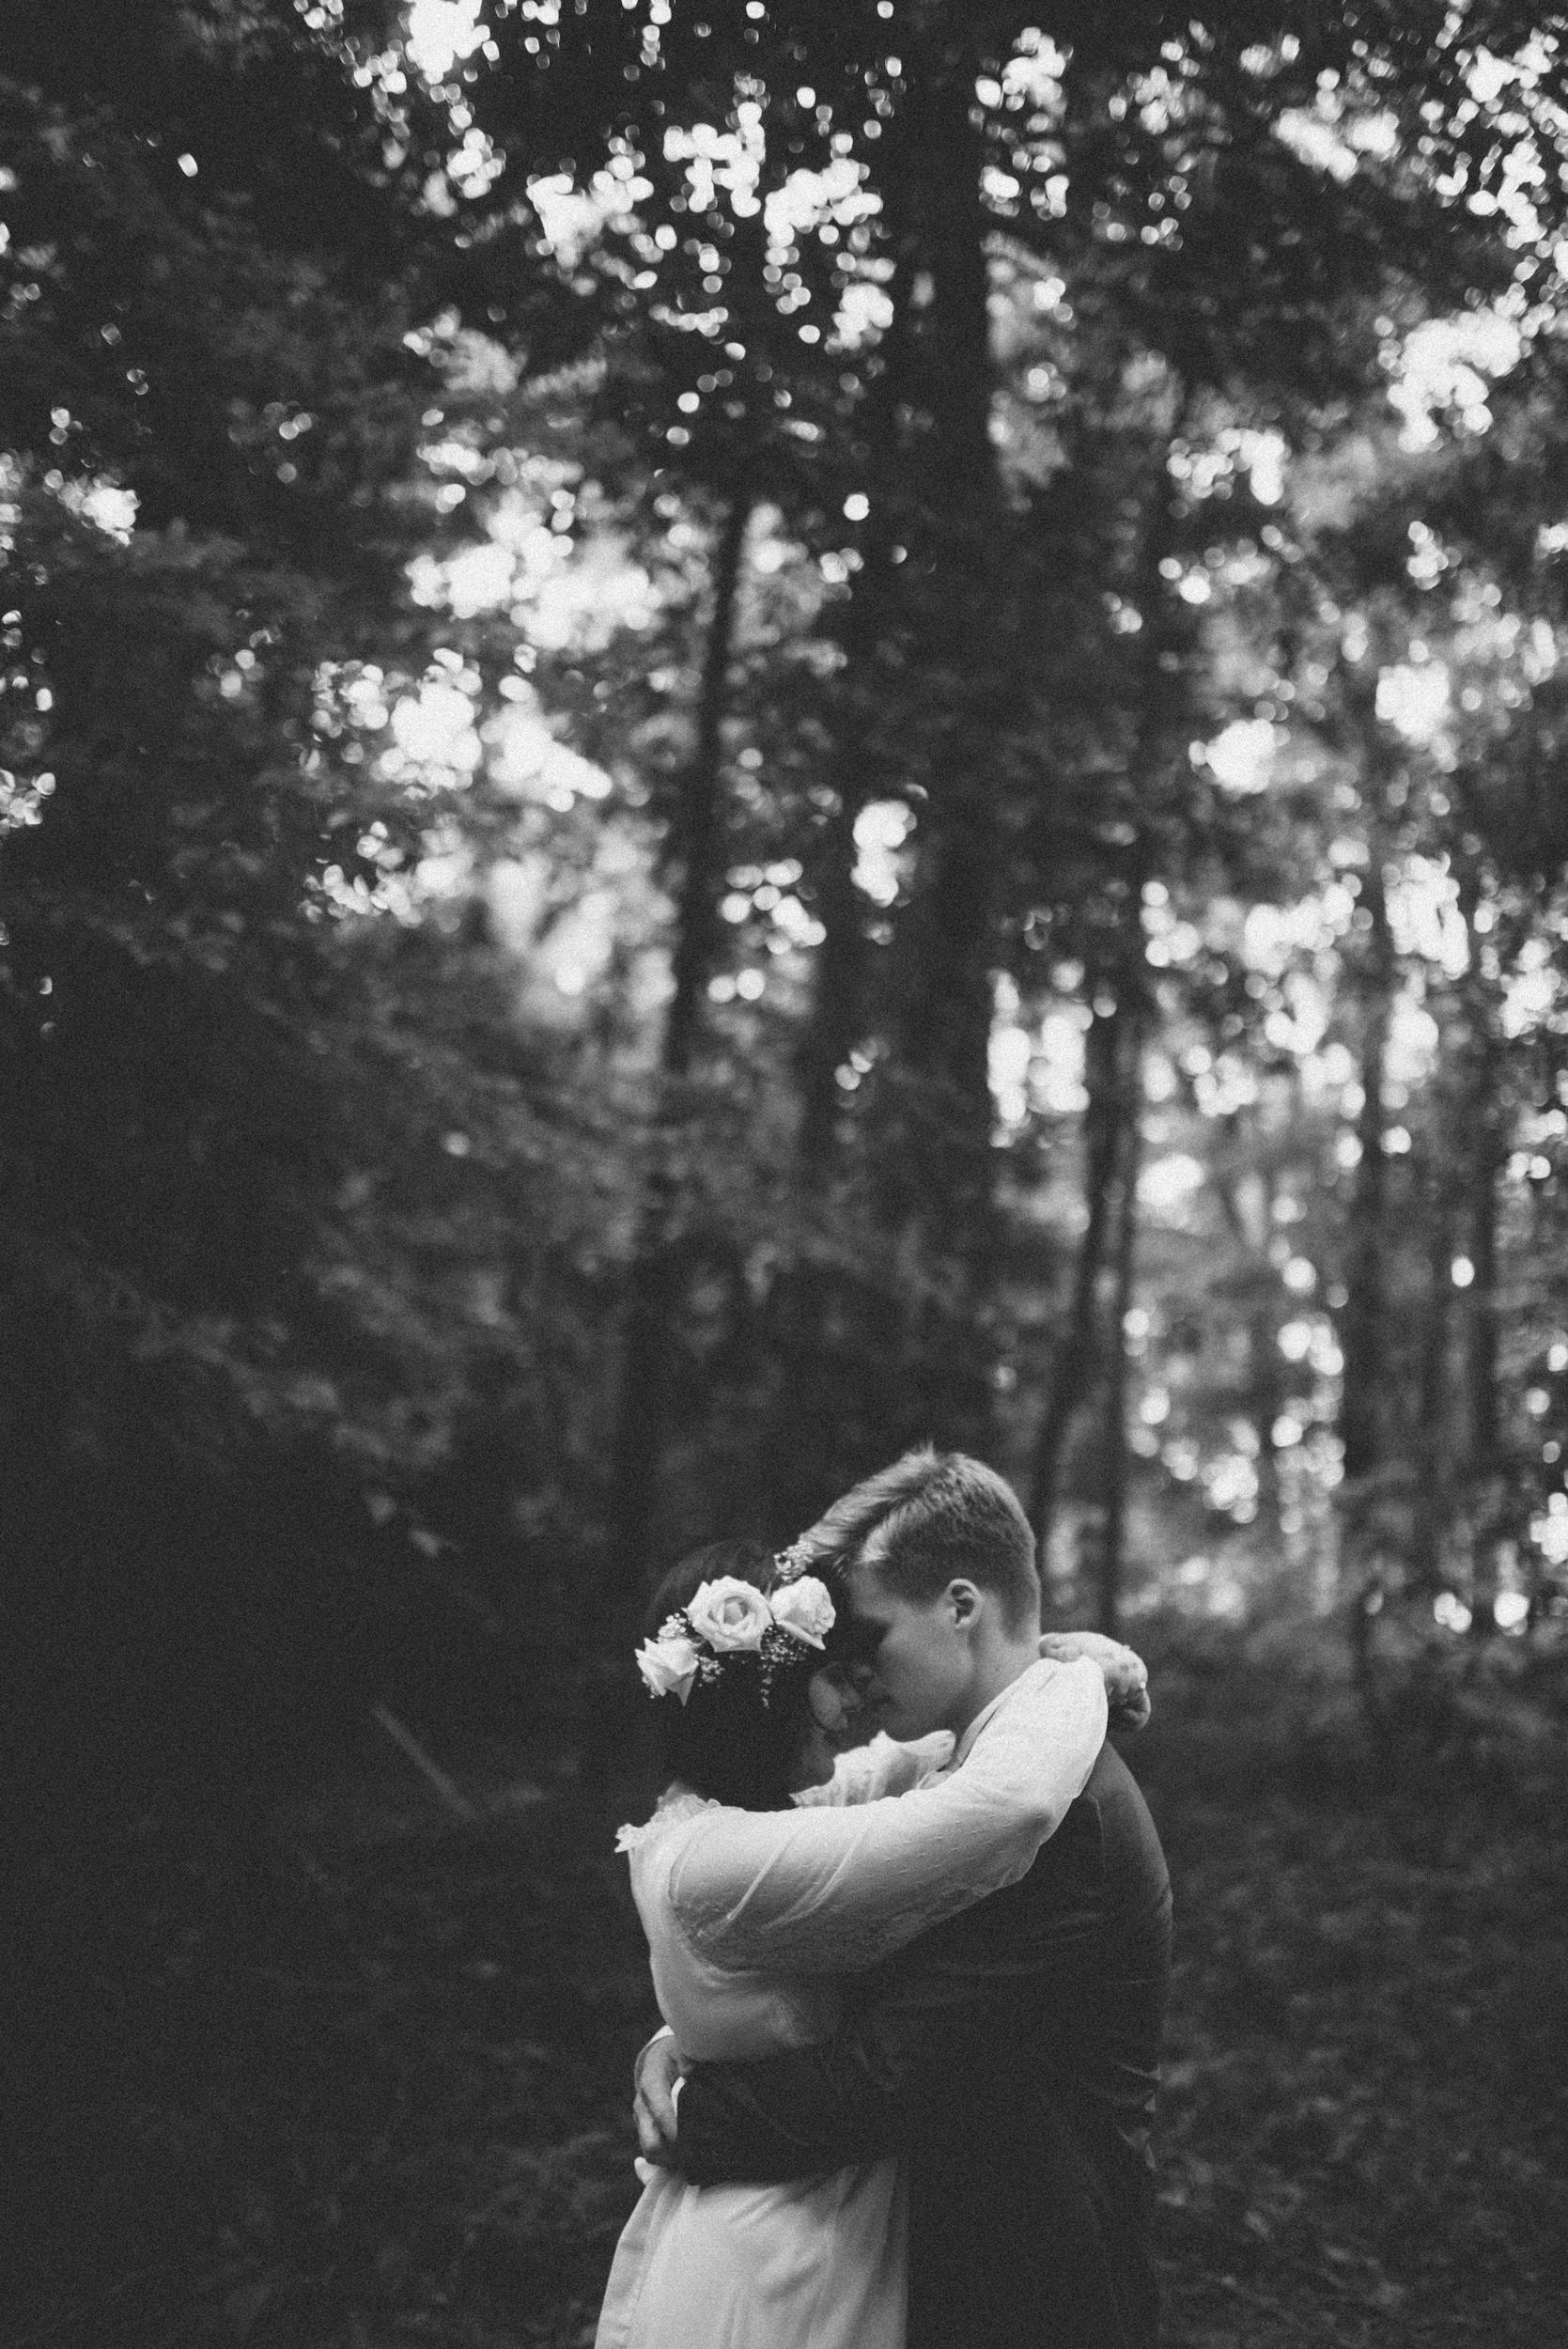 ofRen_weddingphotographer-157.jpg